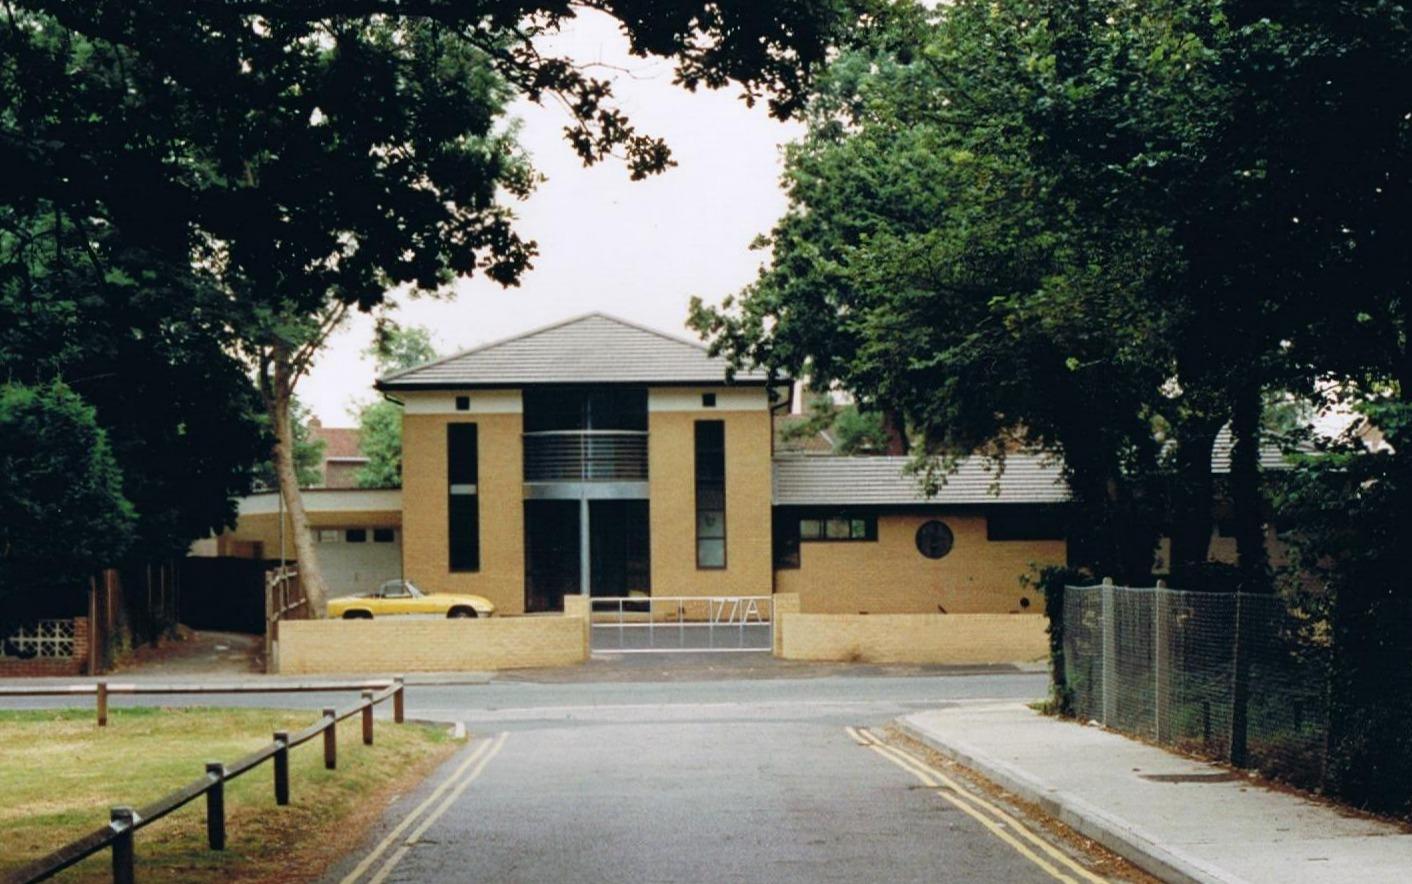 1996: Axis House